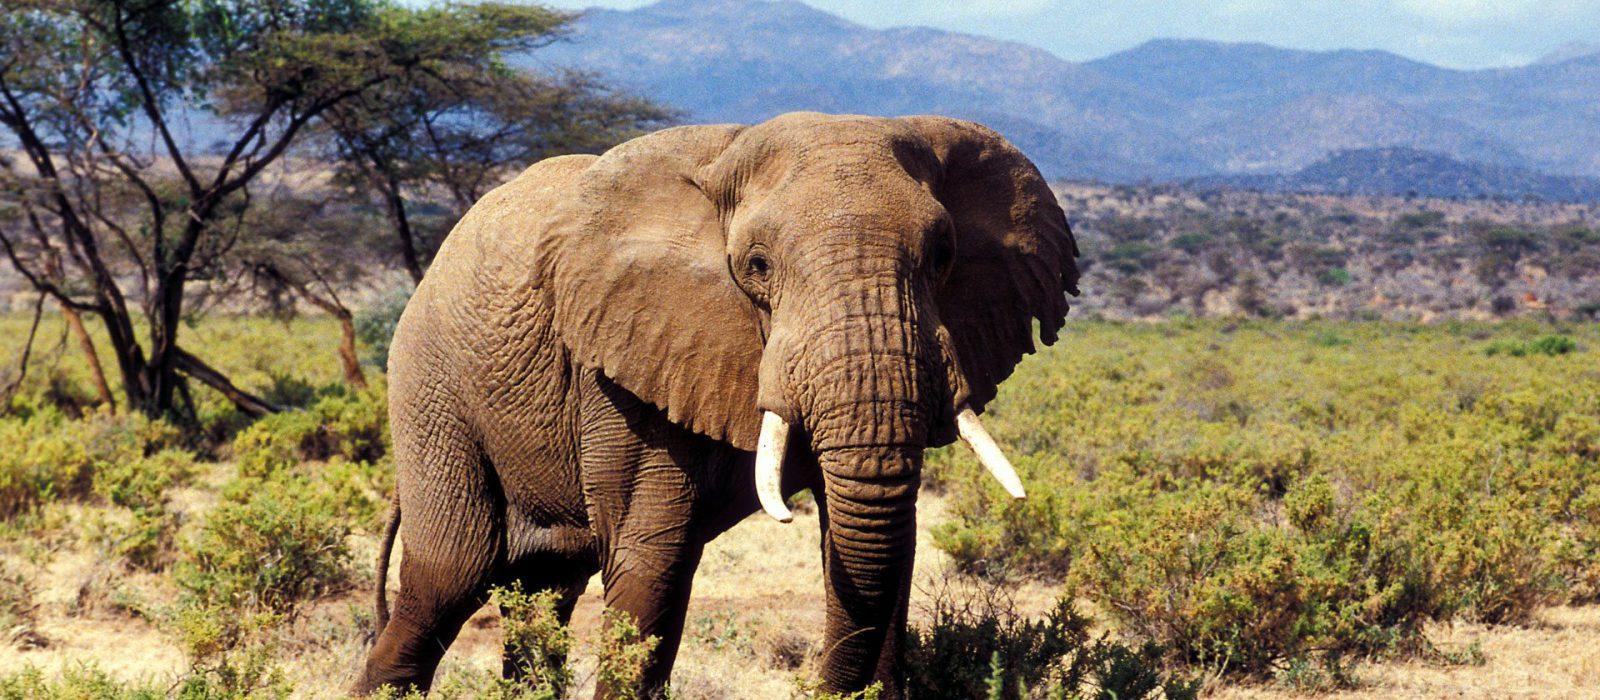 Safari from Nairobi